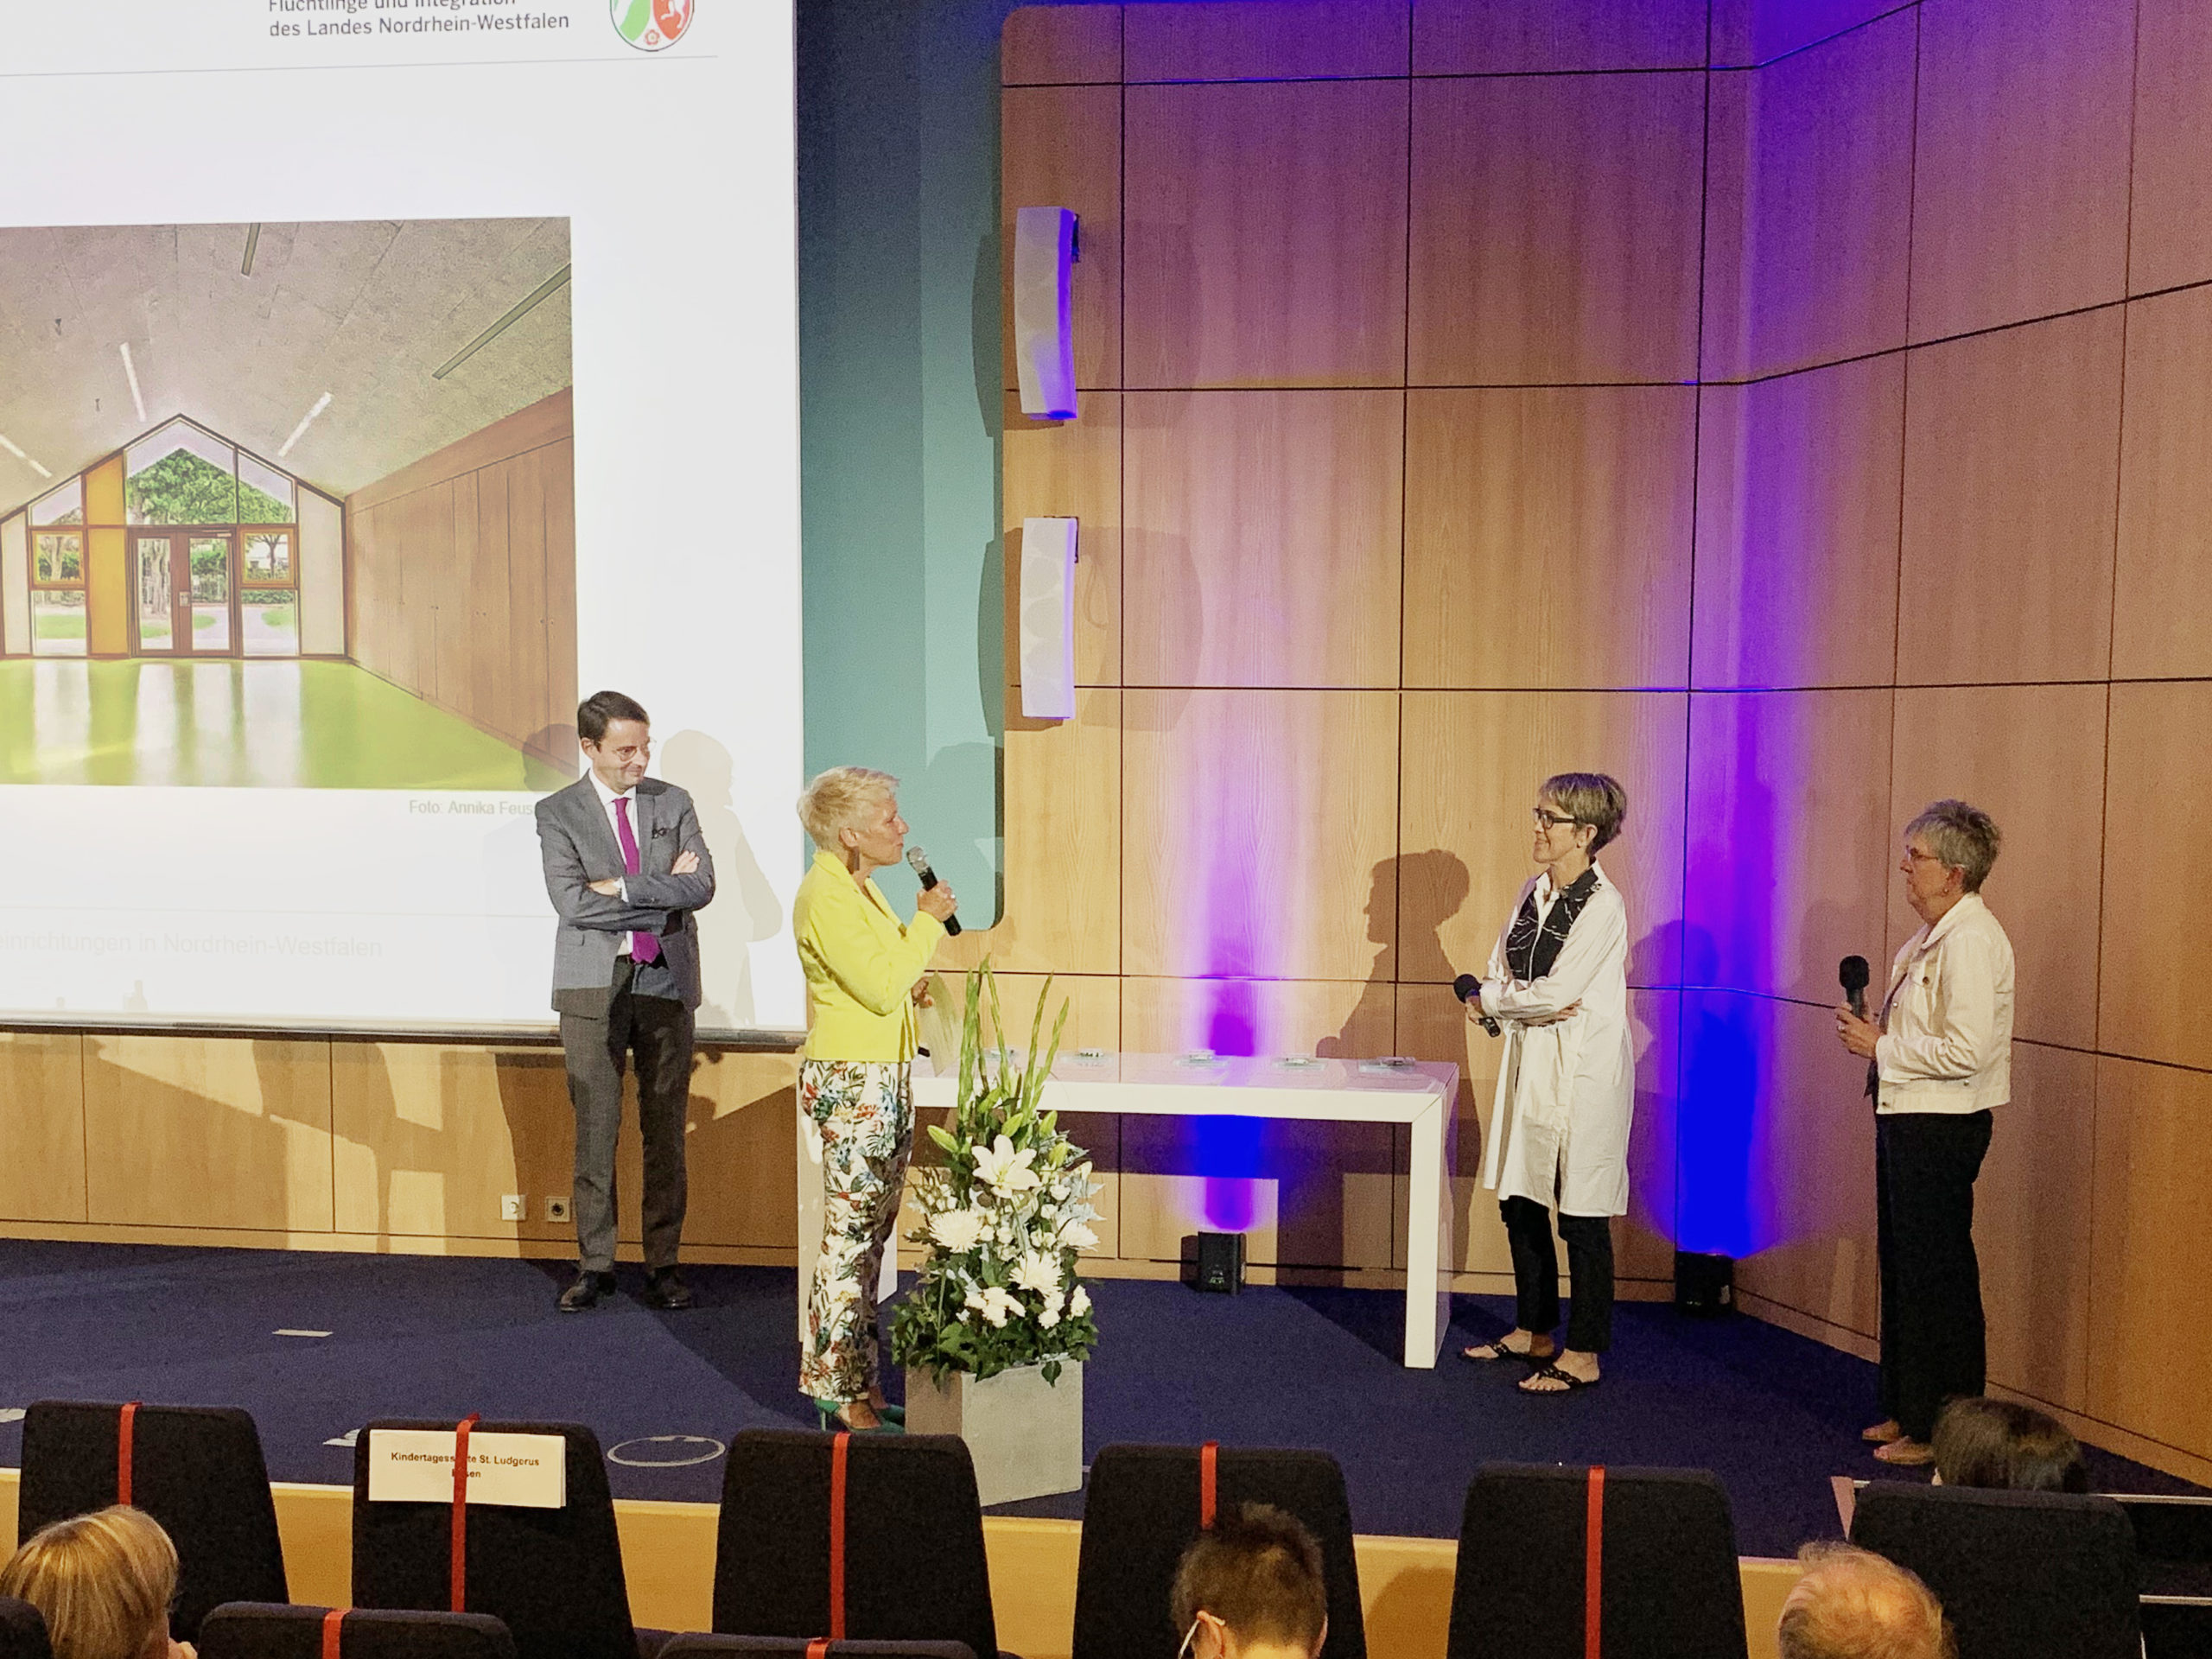 Preisverleihung Kita Preis NRW 2020